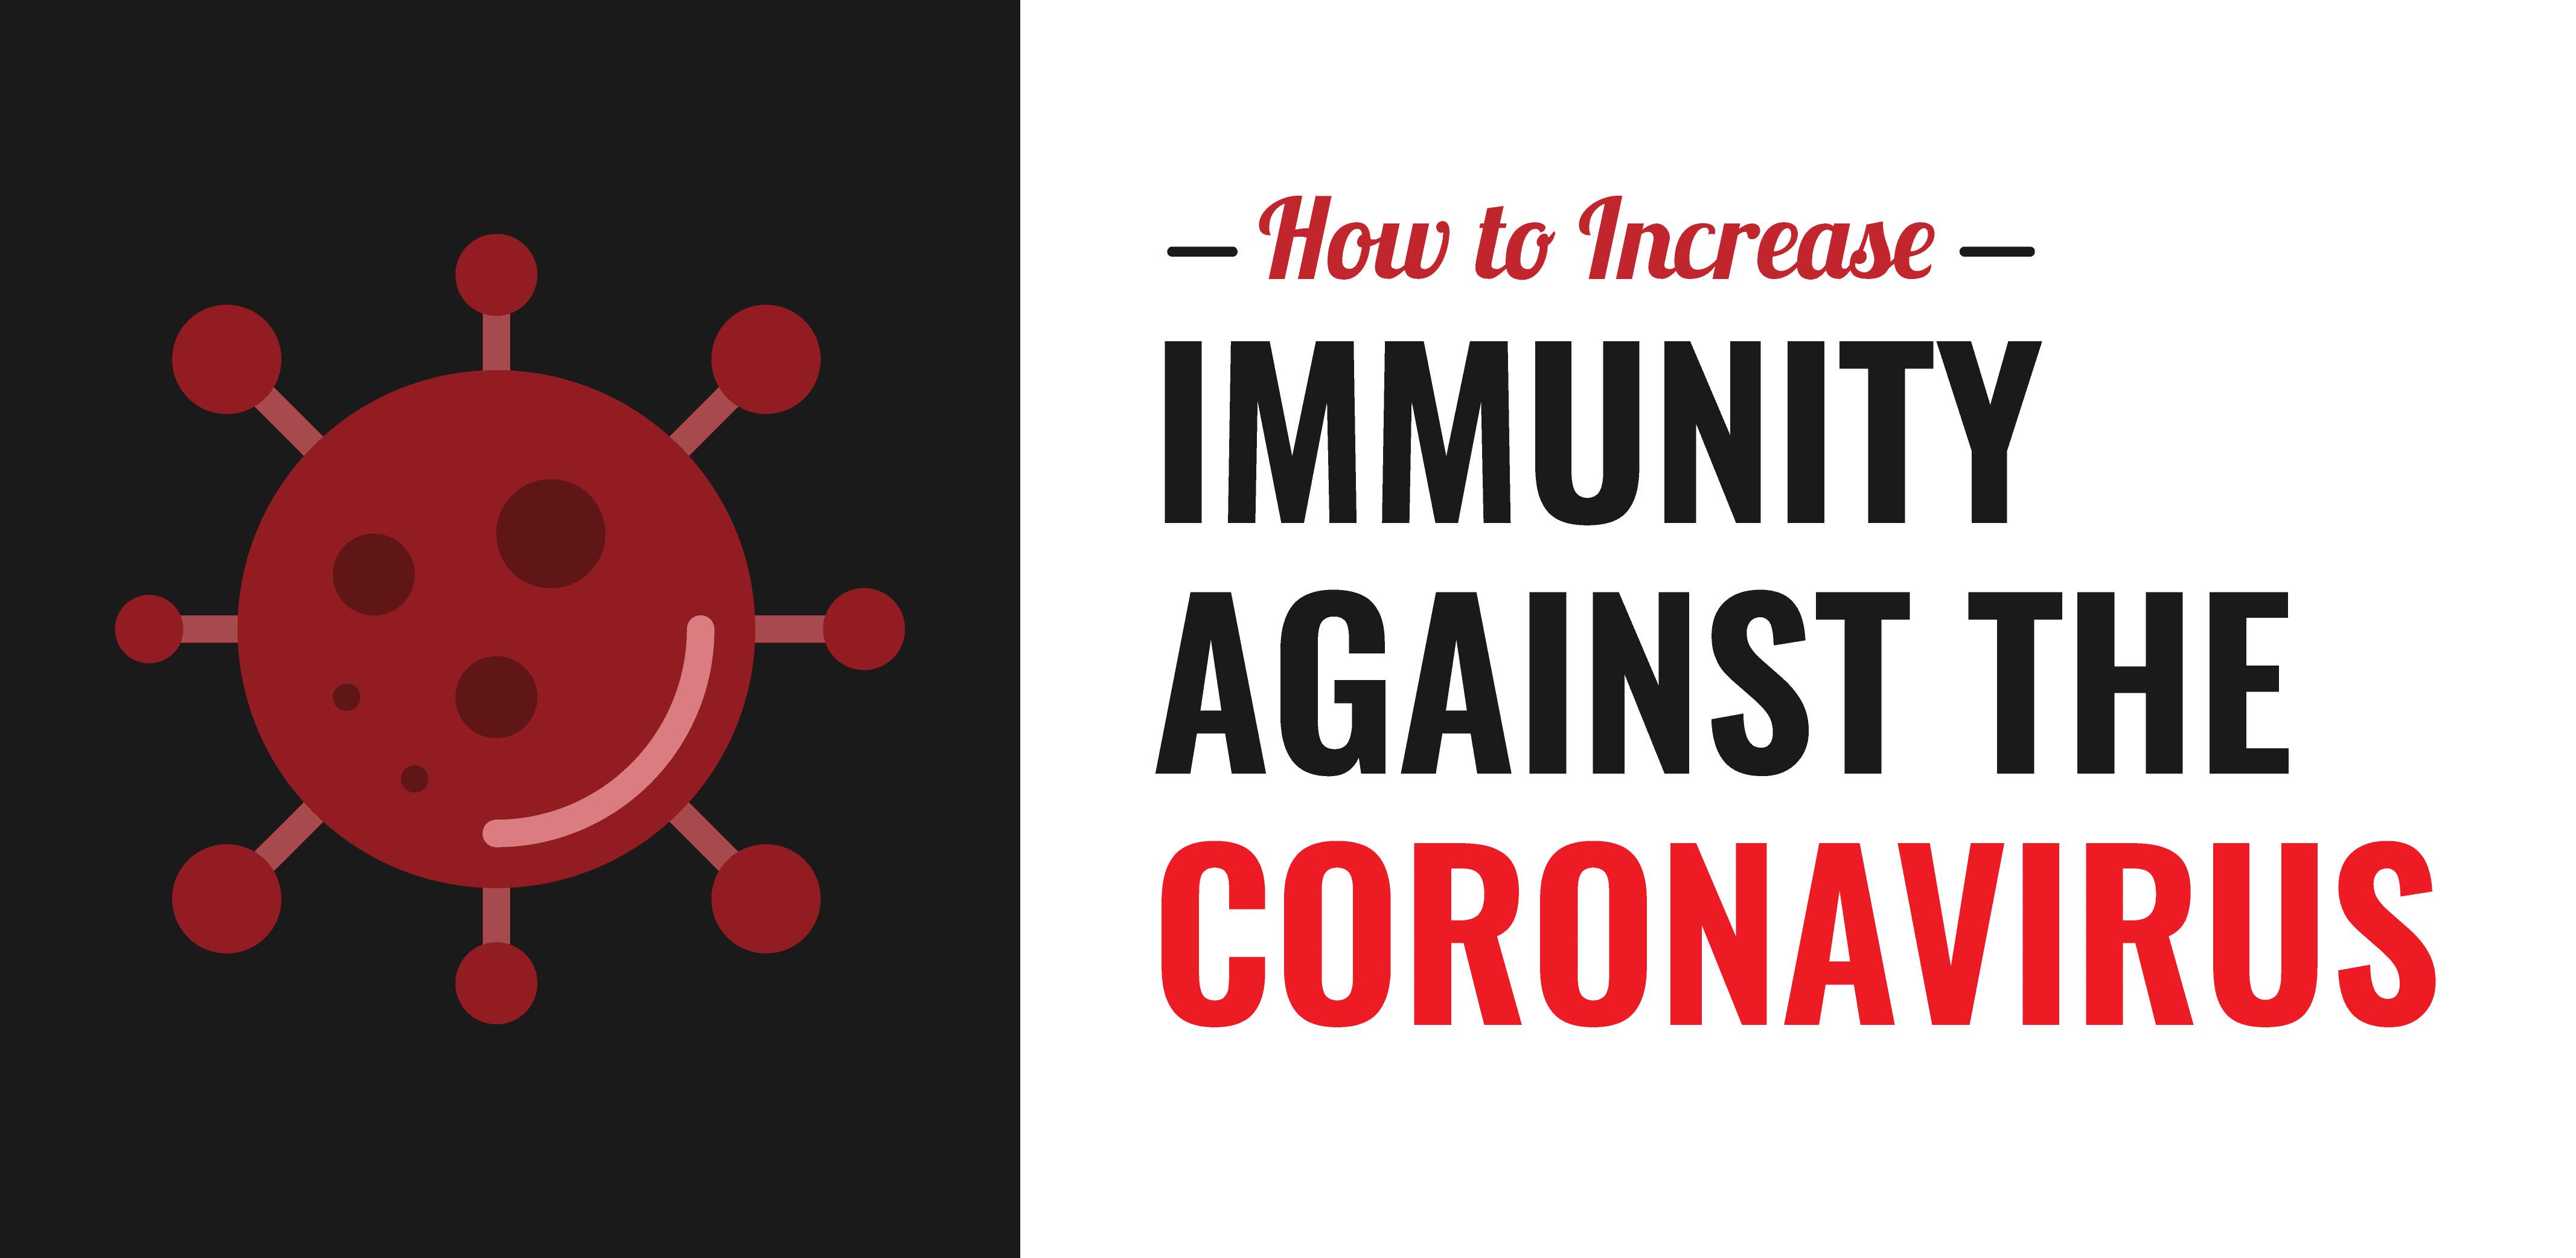 How to Increase Immunity Against the Coronavirus - Header Image